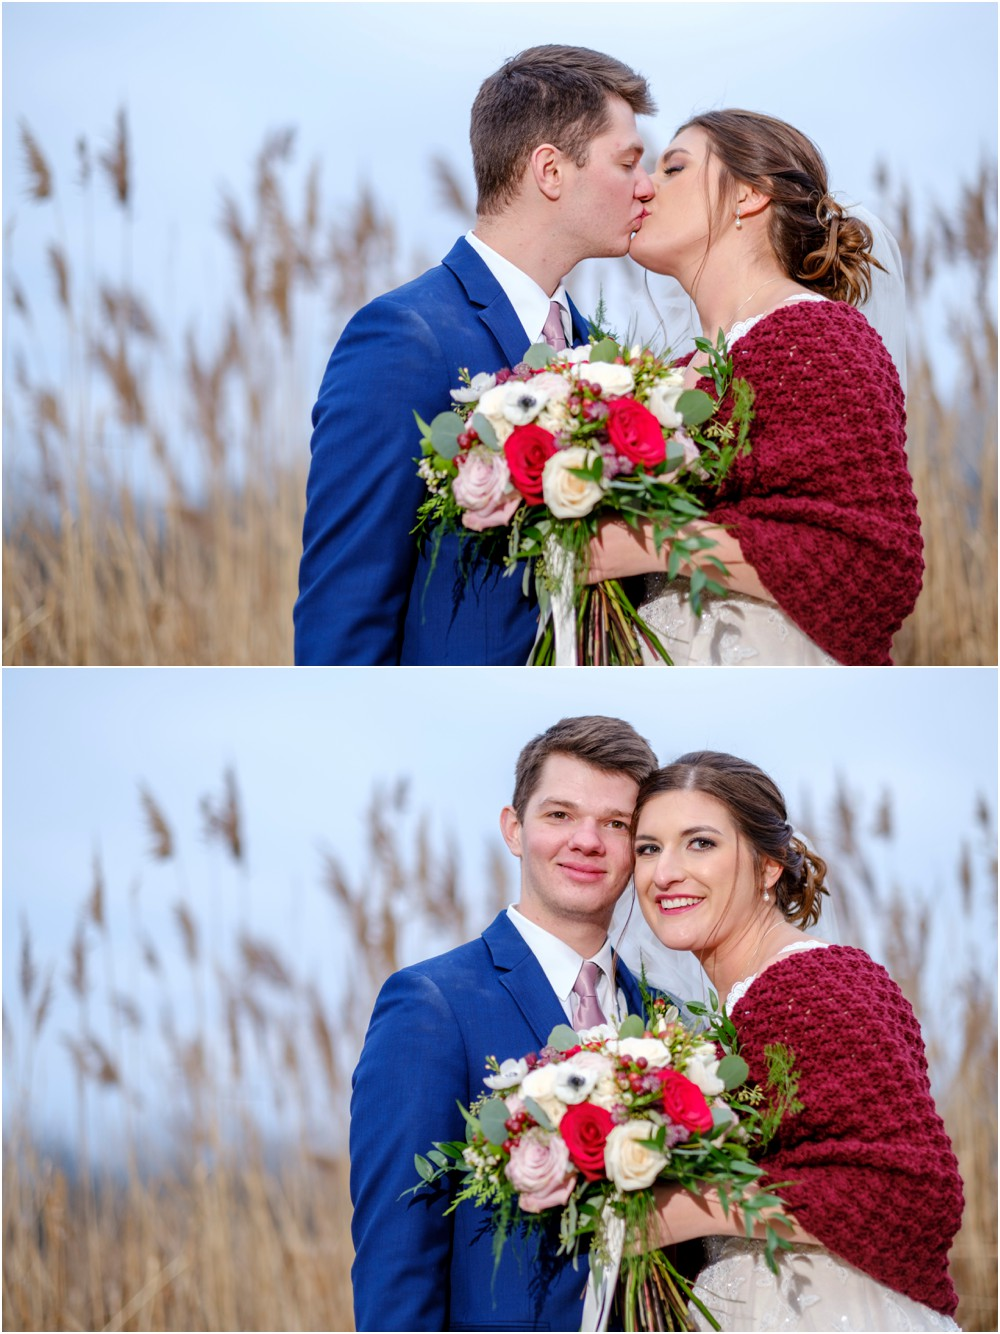 Washington-TownshipPark-Wedding-Pictures_0013.jpg